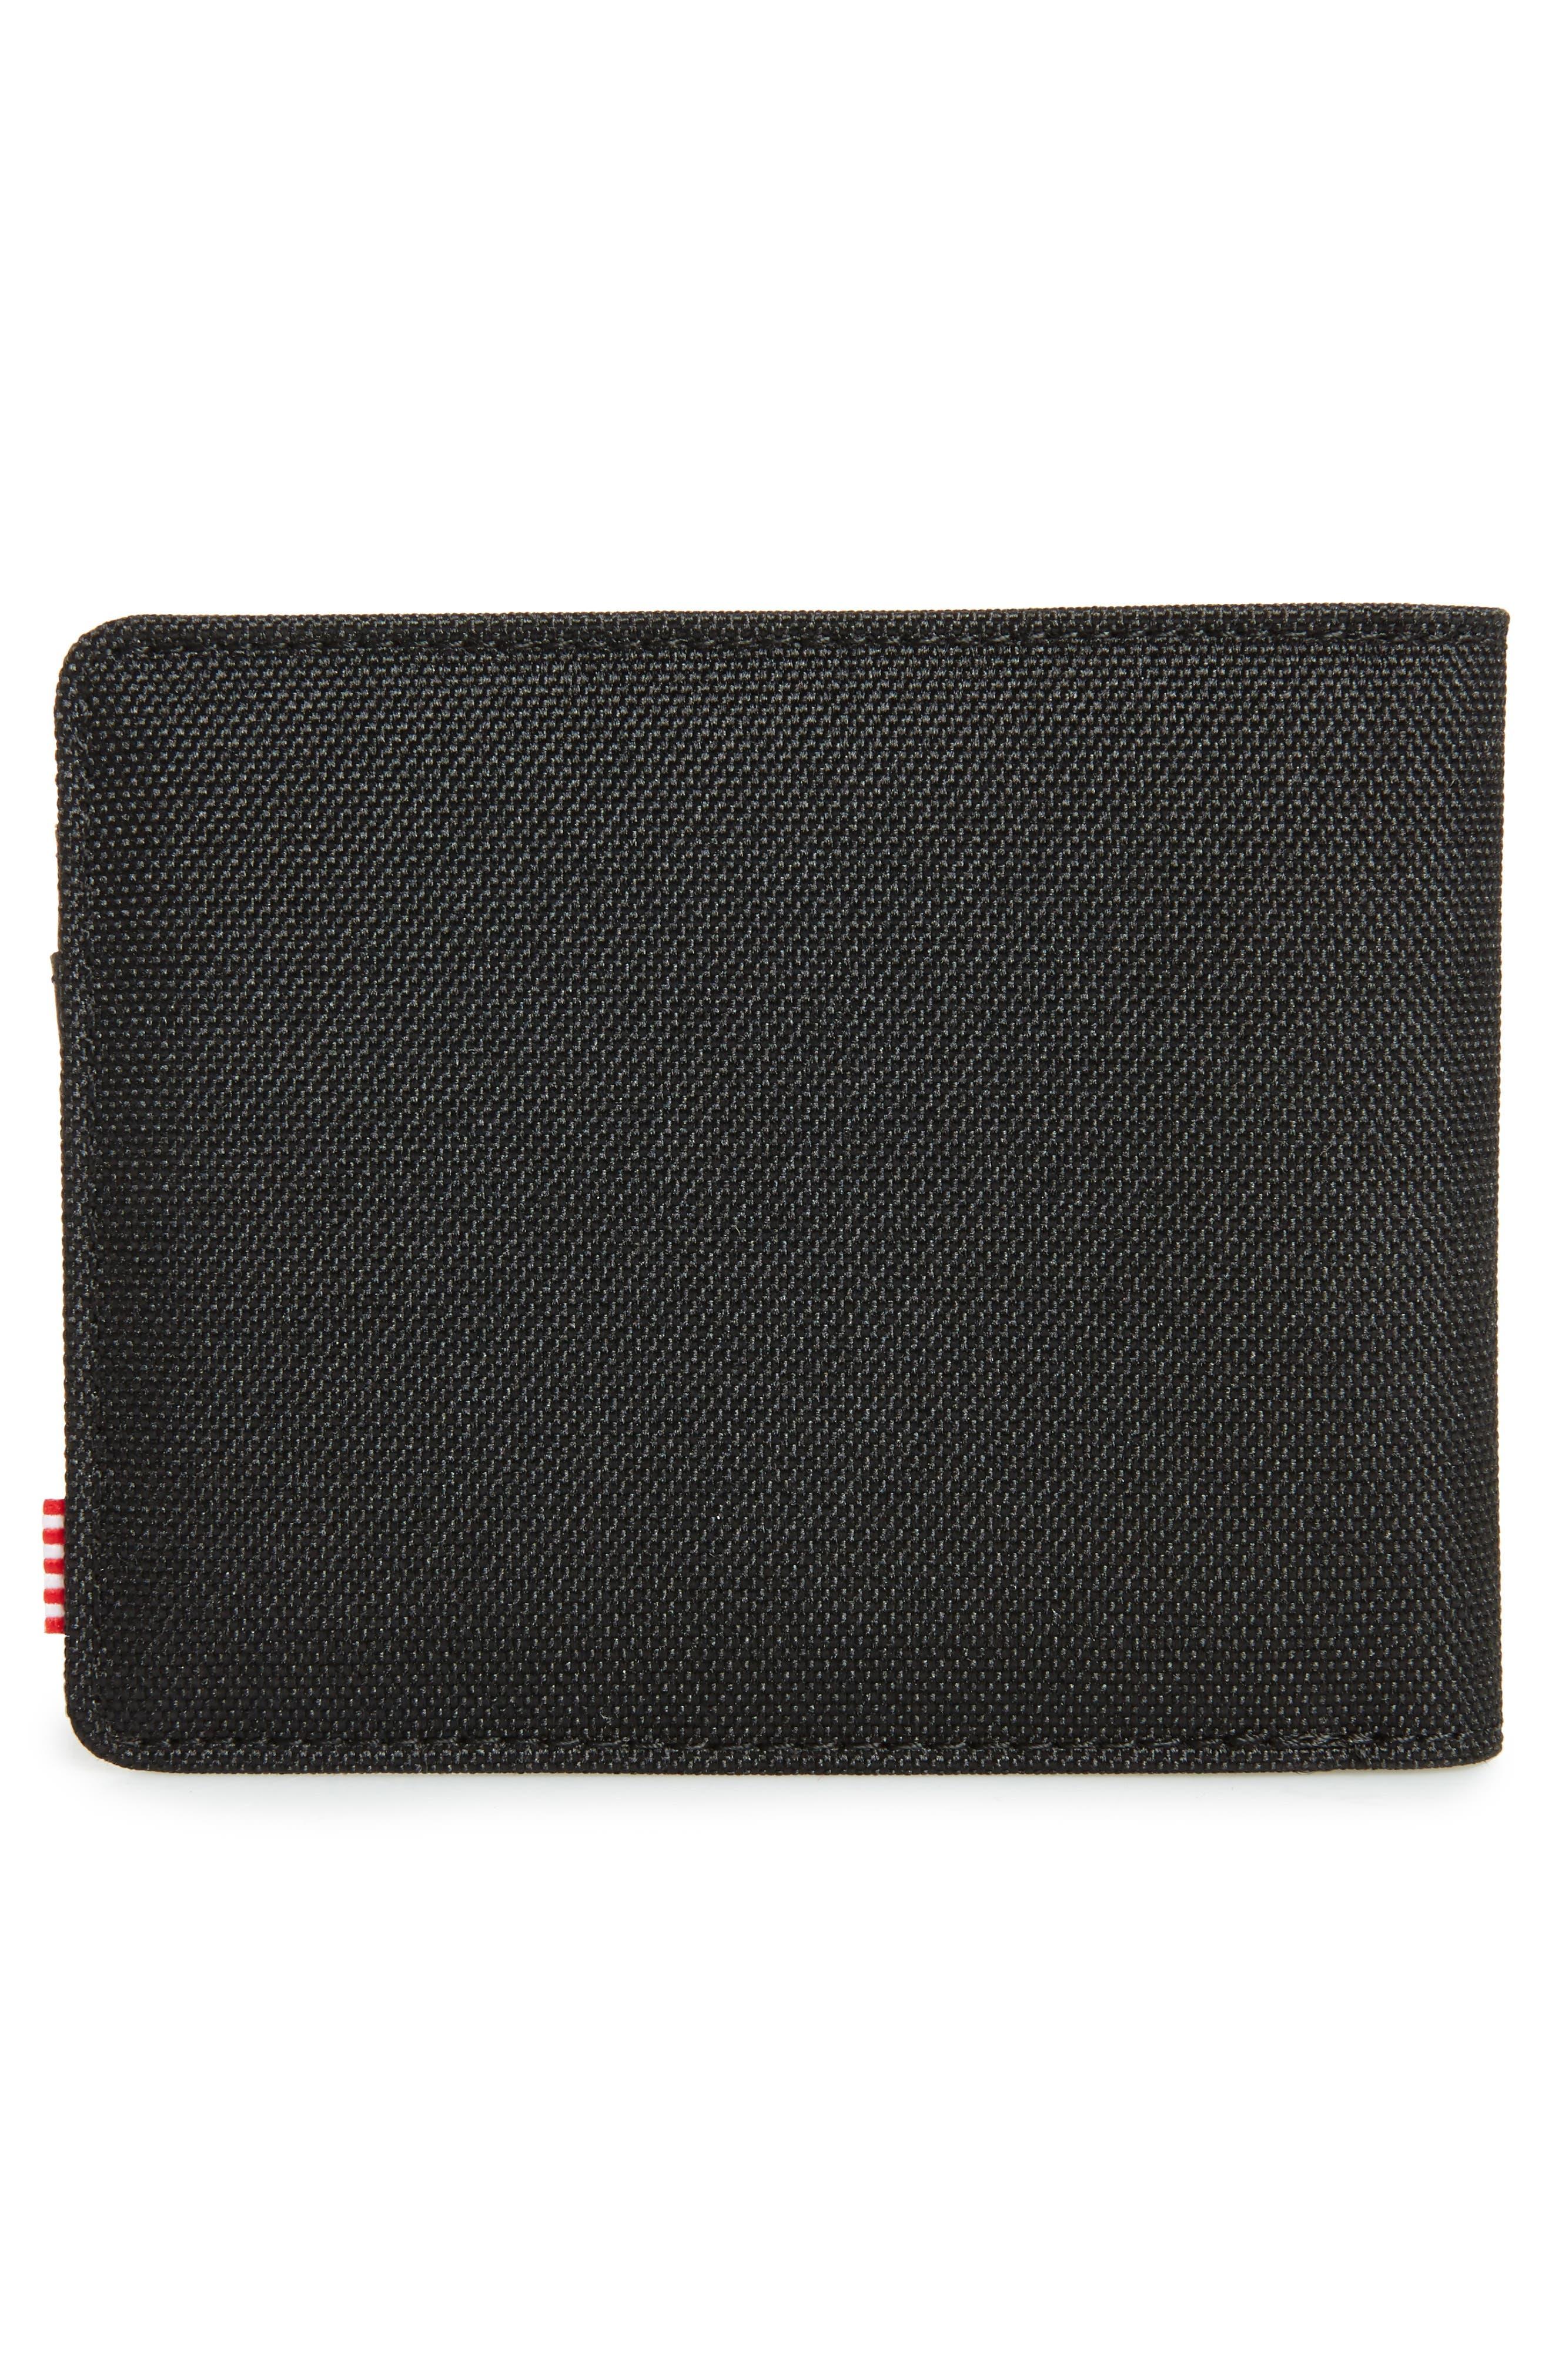 HERSCHEL SUPPLY CO., Hank RFID Bifold Wallet, Alternate thumbnail 3, color, BLACK